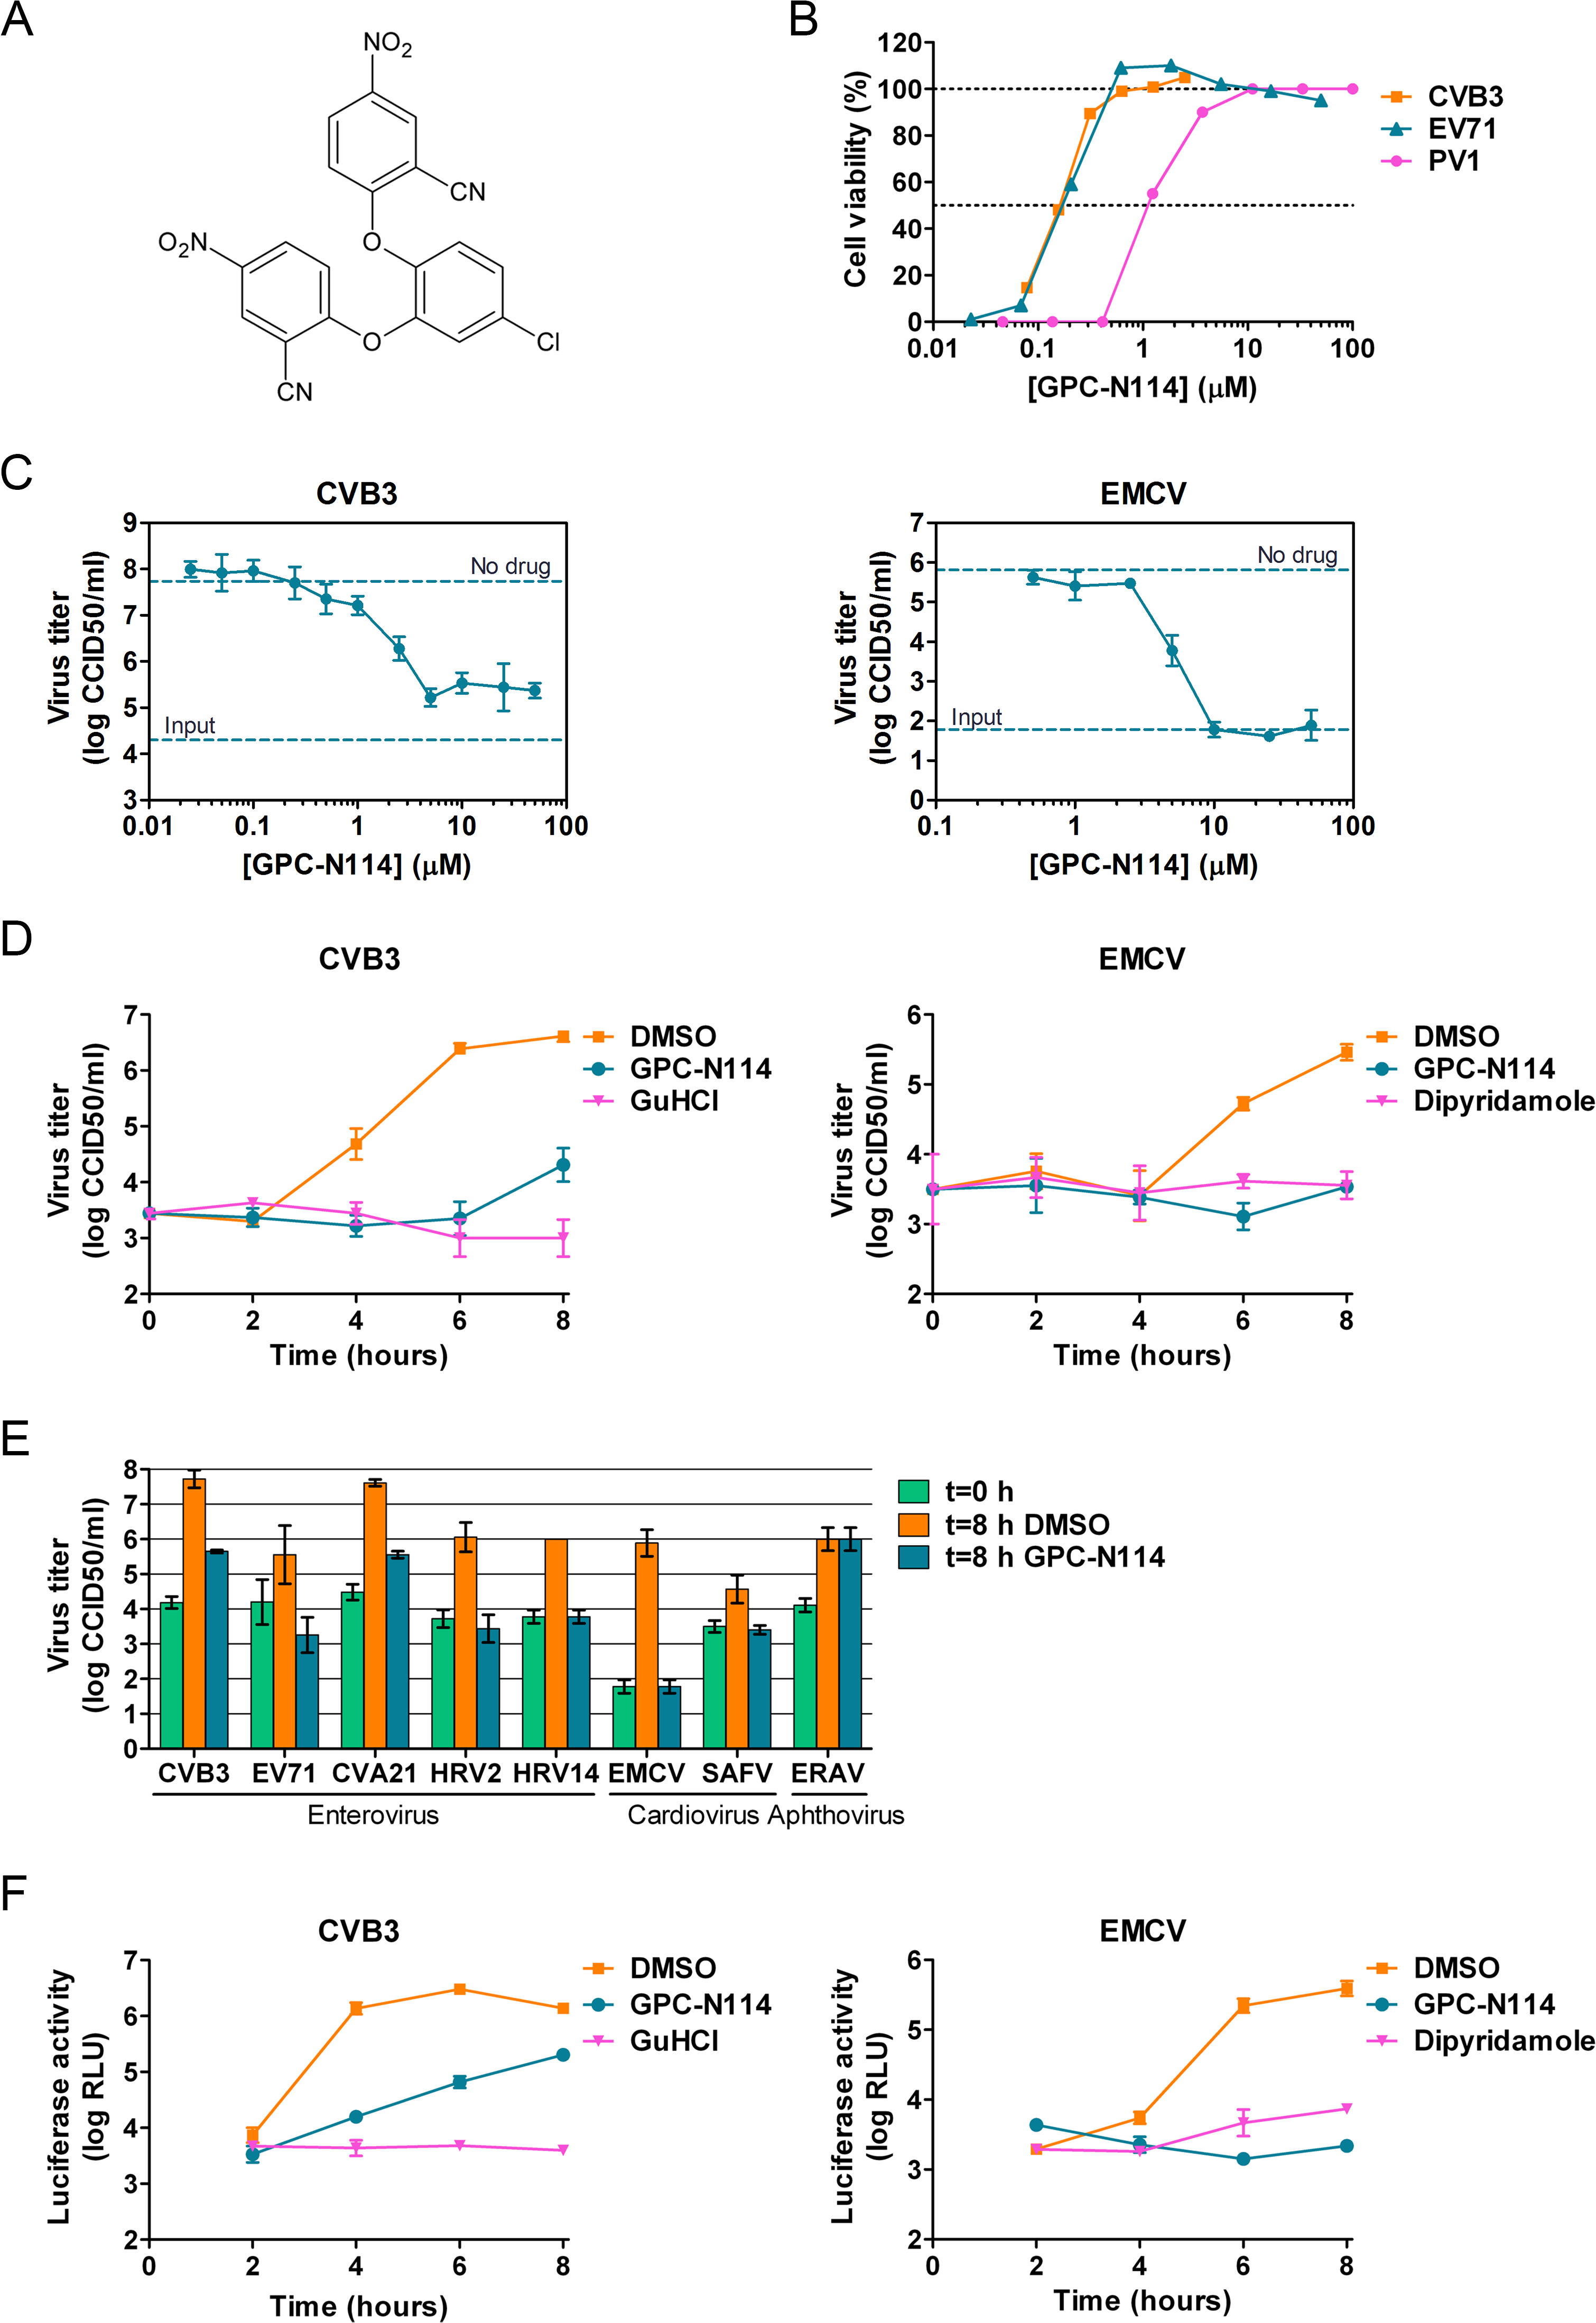 GPC-N114 inhibits picornavirus replication.